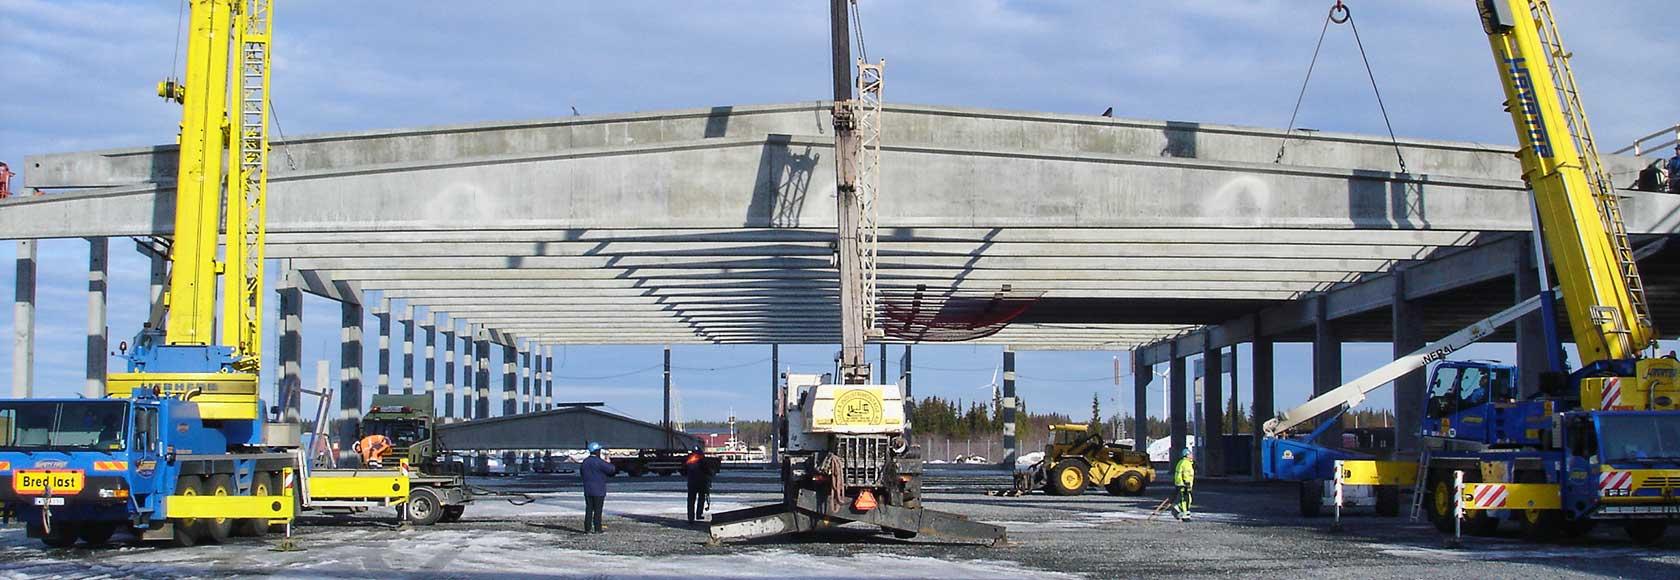 Hellströms bygger magasin 8 på Haraholmen